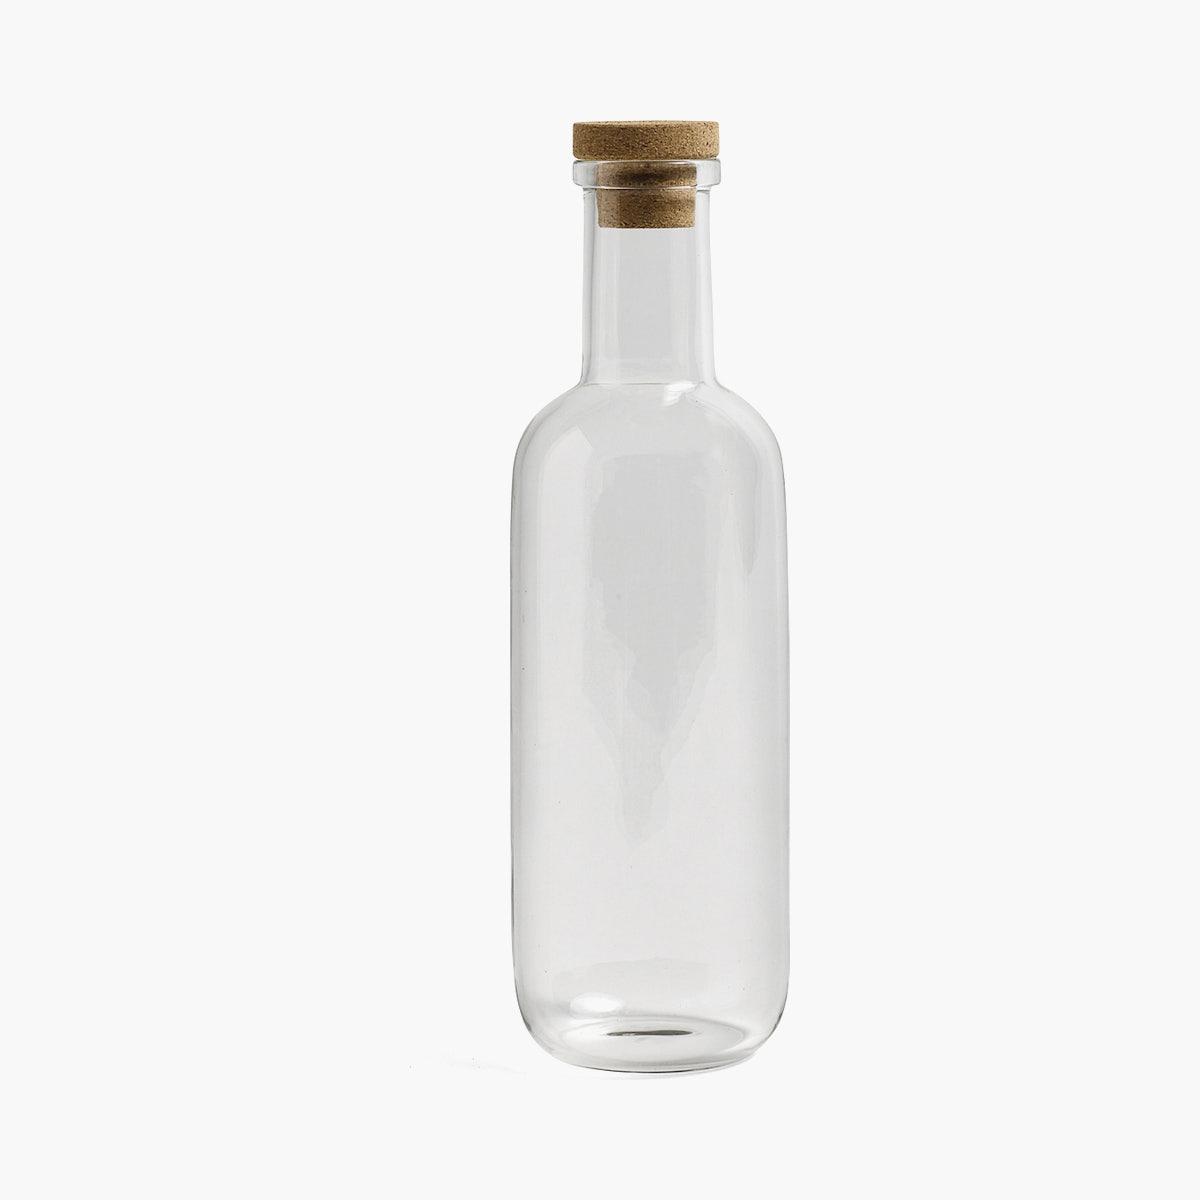 HAY Bottle - Small